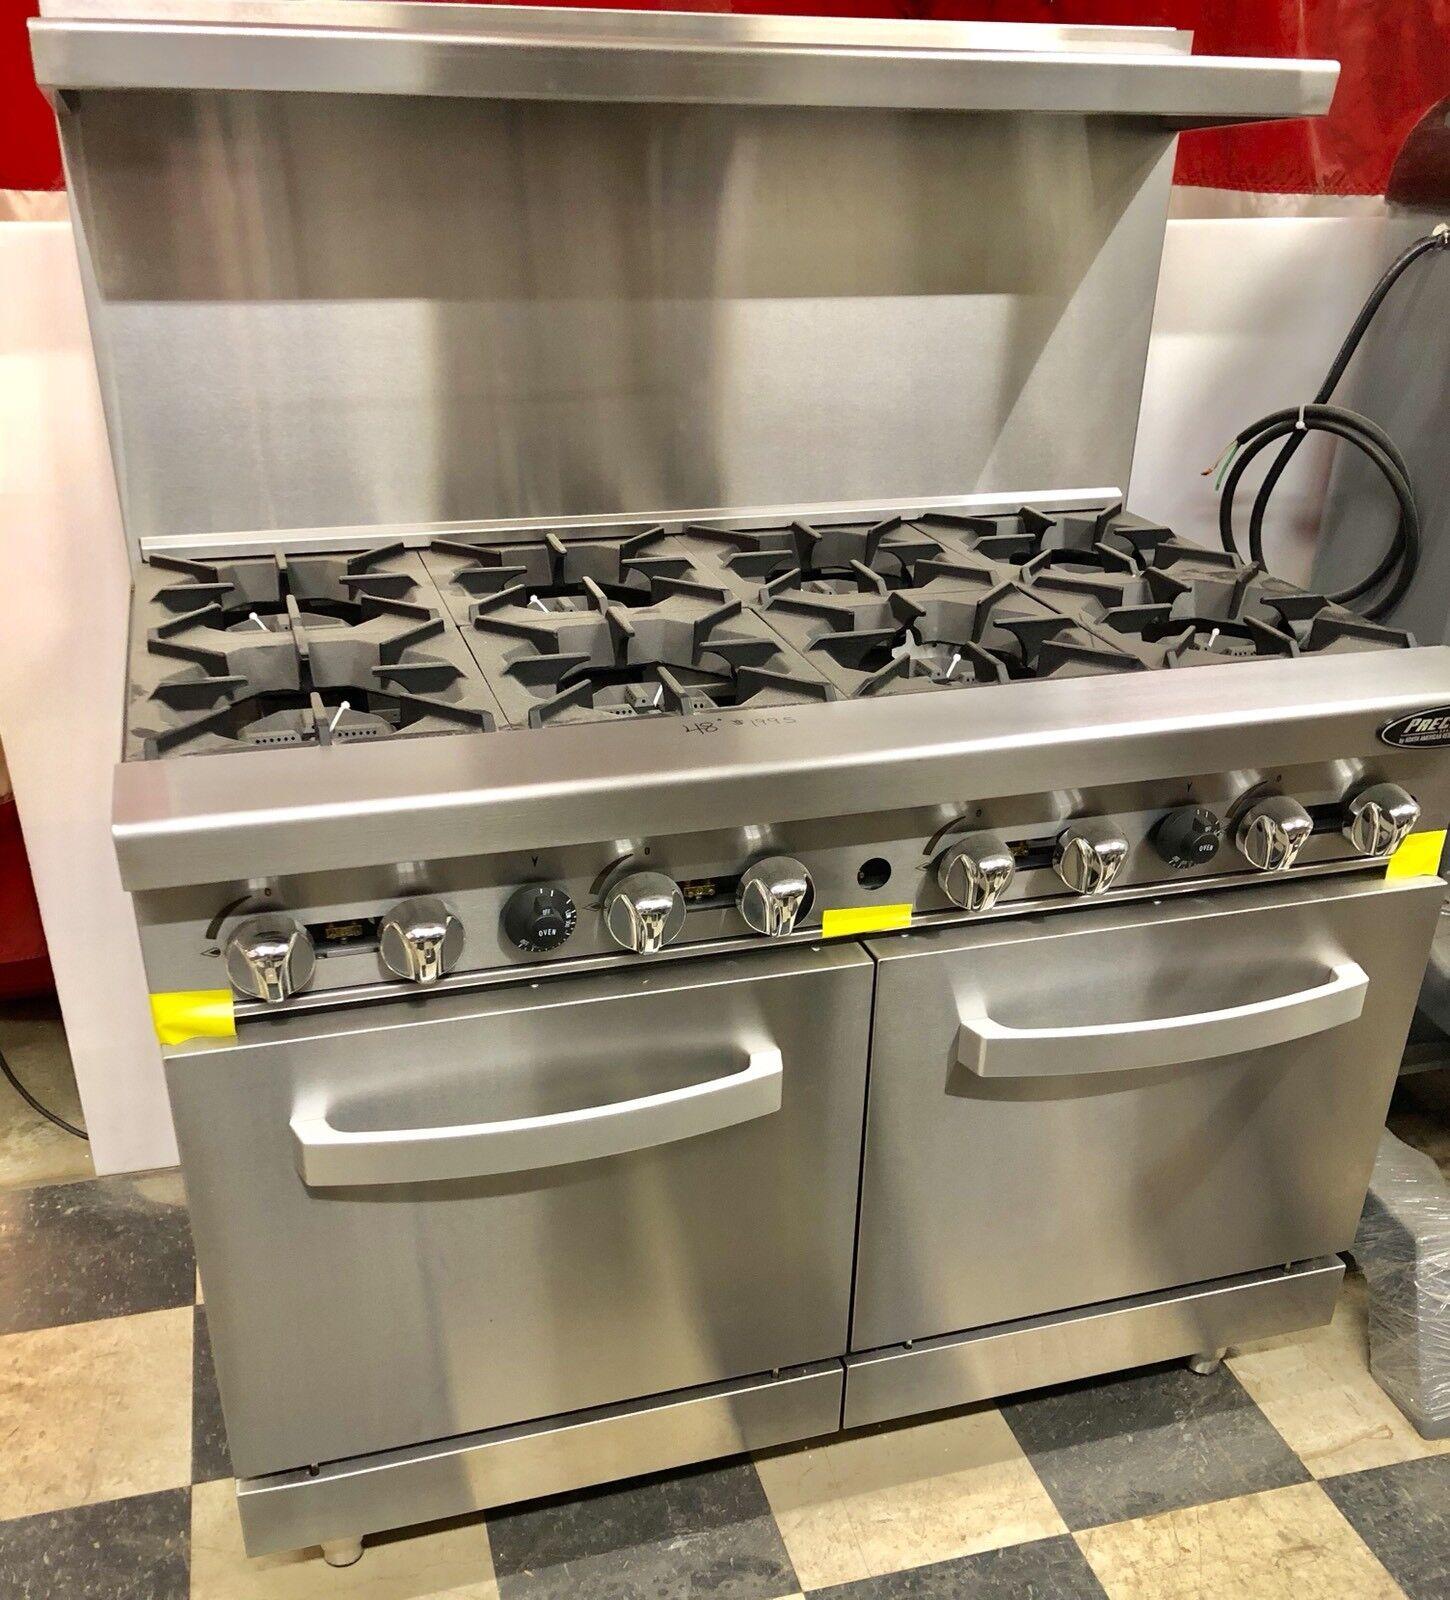 "8 Burner range Heavy Duty 48"" Commercial Restaurant Stove Gas Double Oven"